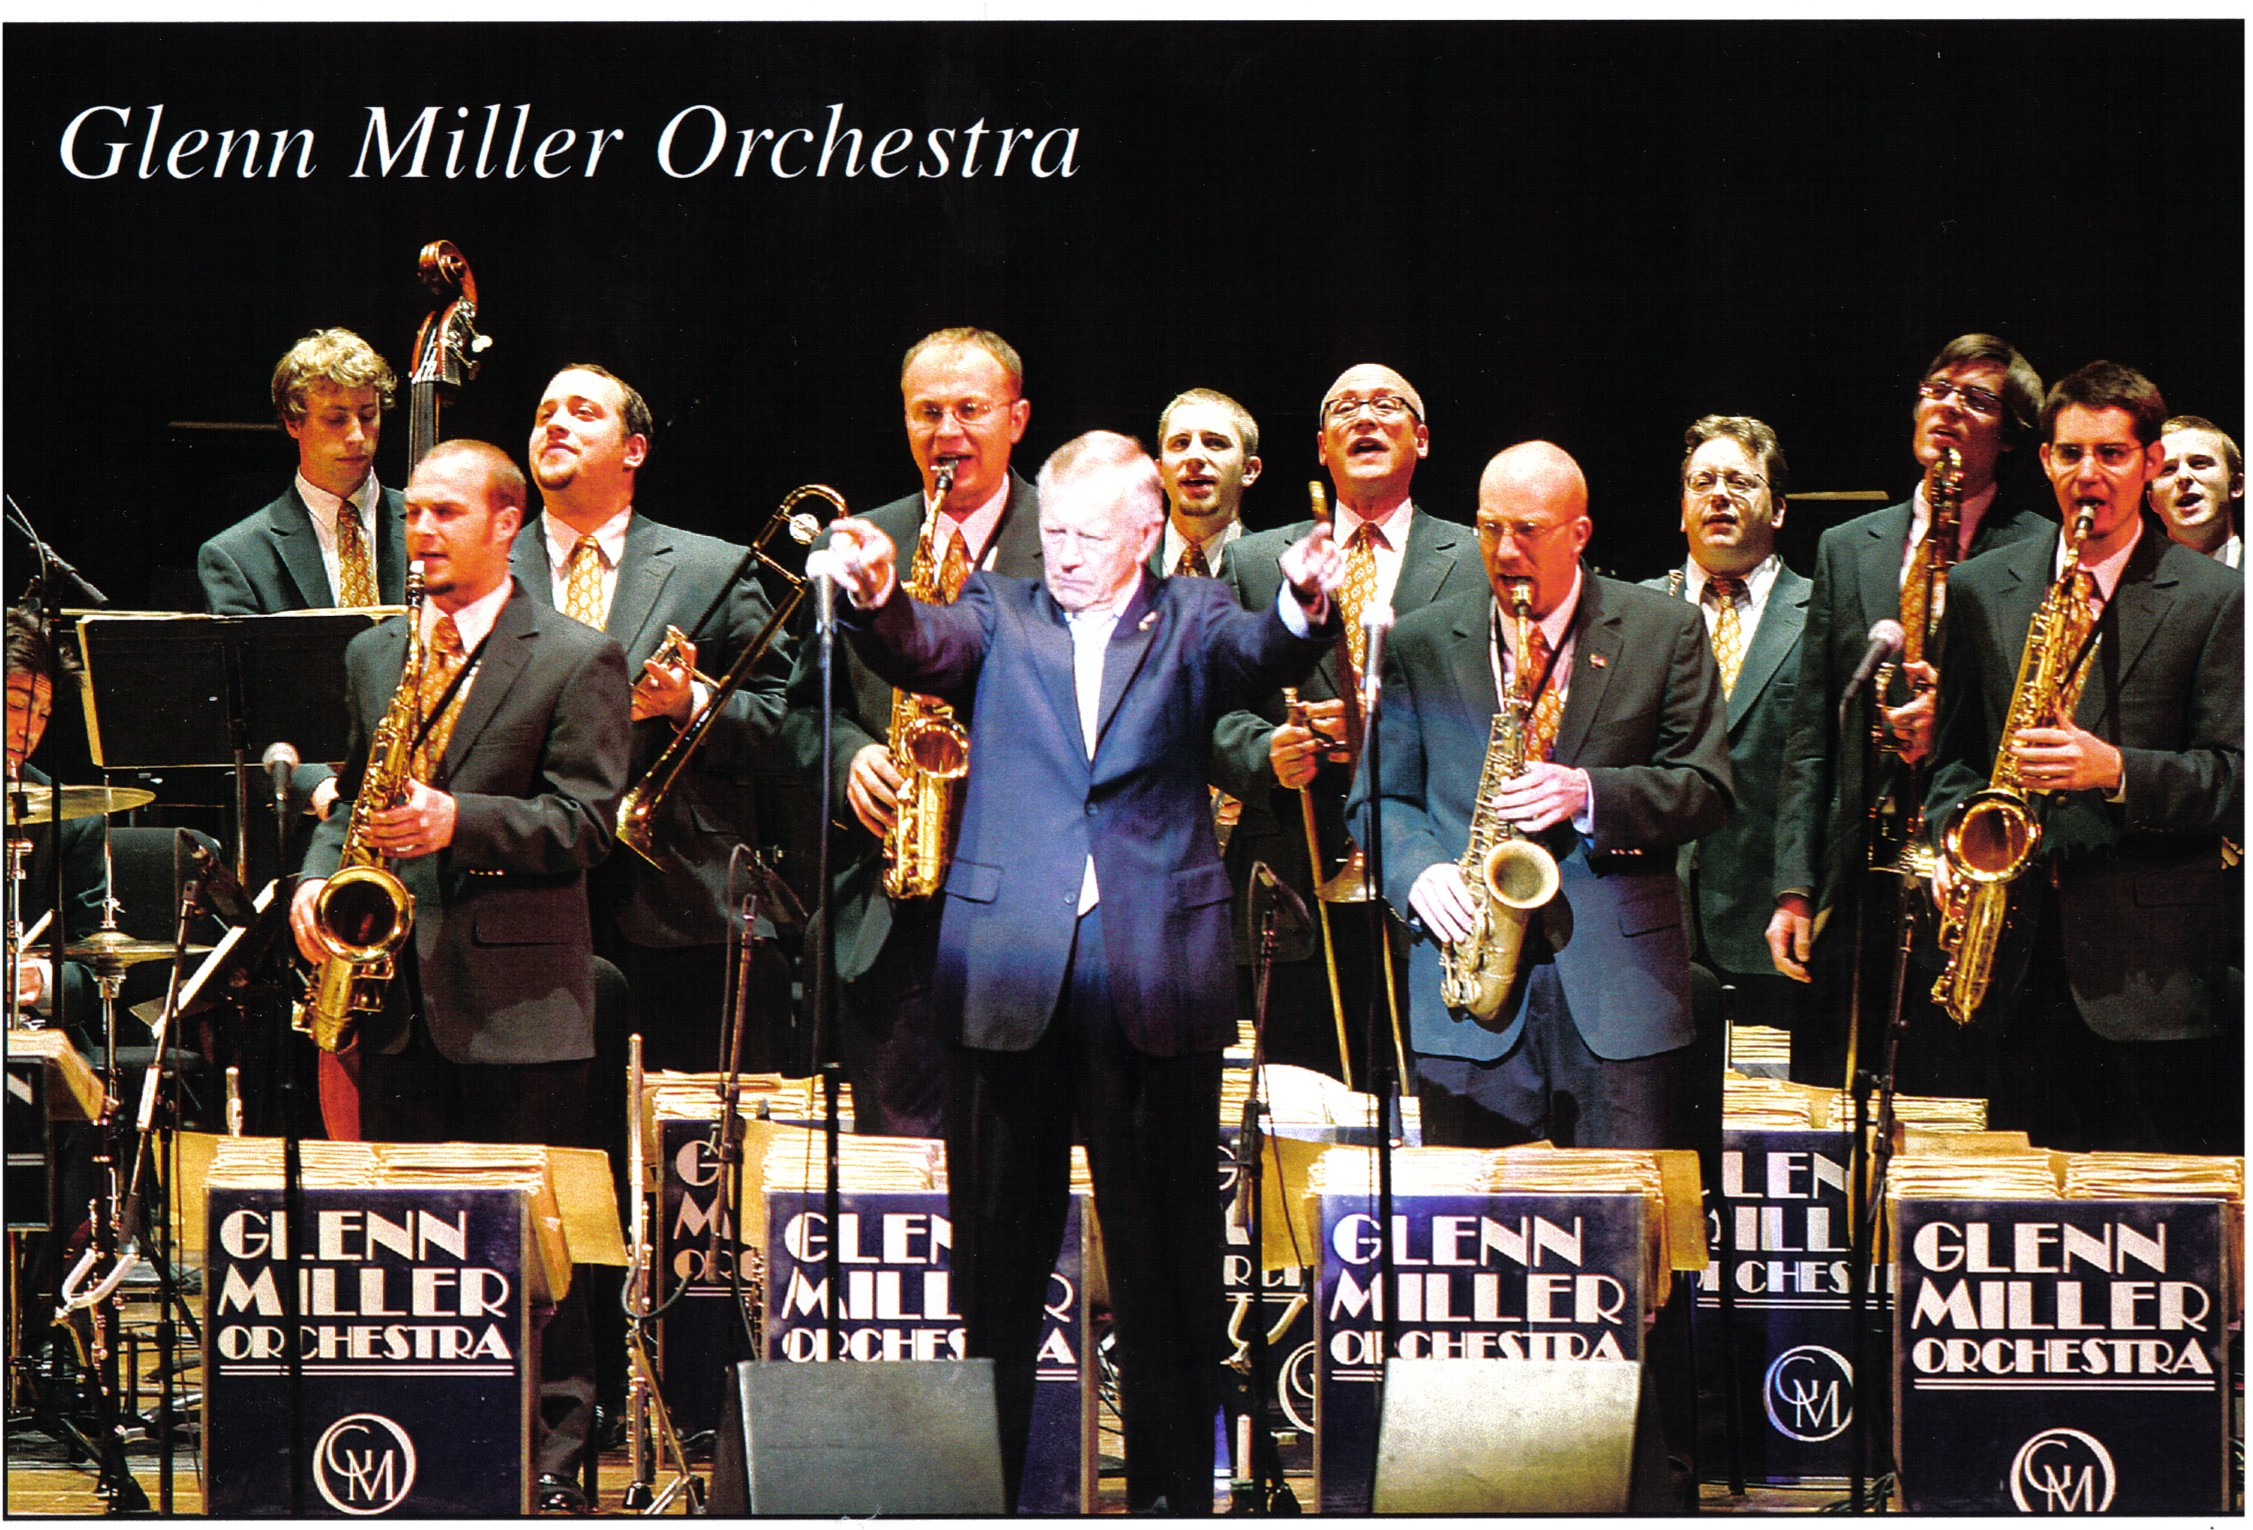 Westchester Broadway Theatre Presents THE GLENN MILLER ORCHESTRA 11/9